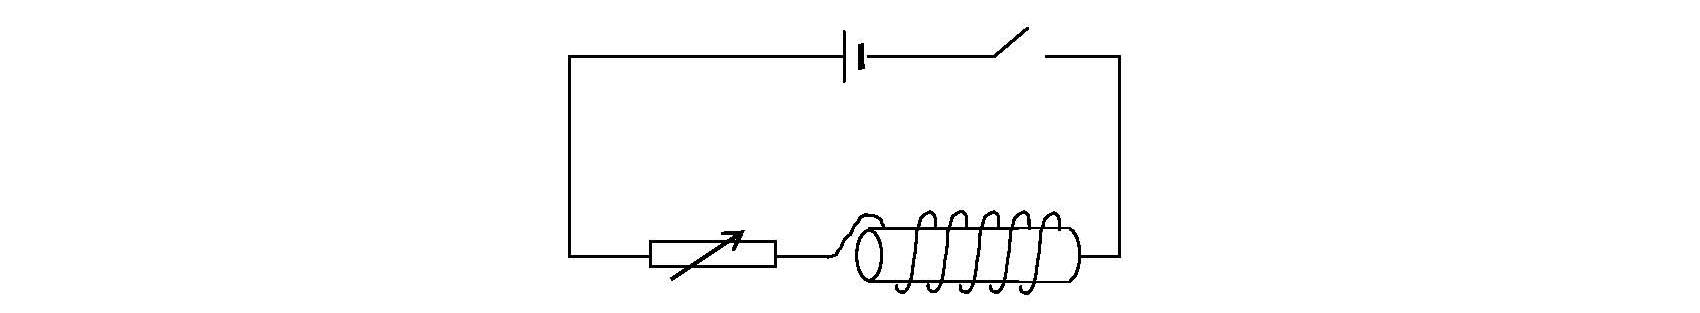 magnetisation of steel. magnetization of steel using direct current (d.c.)